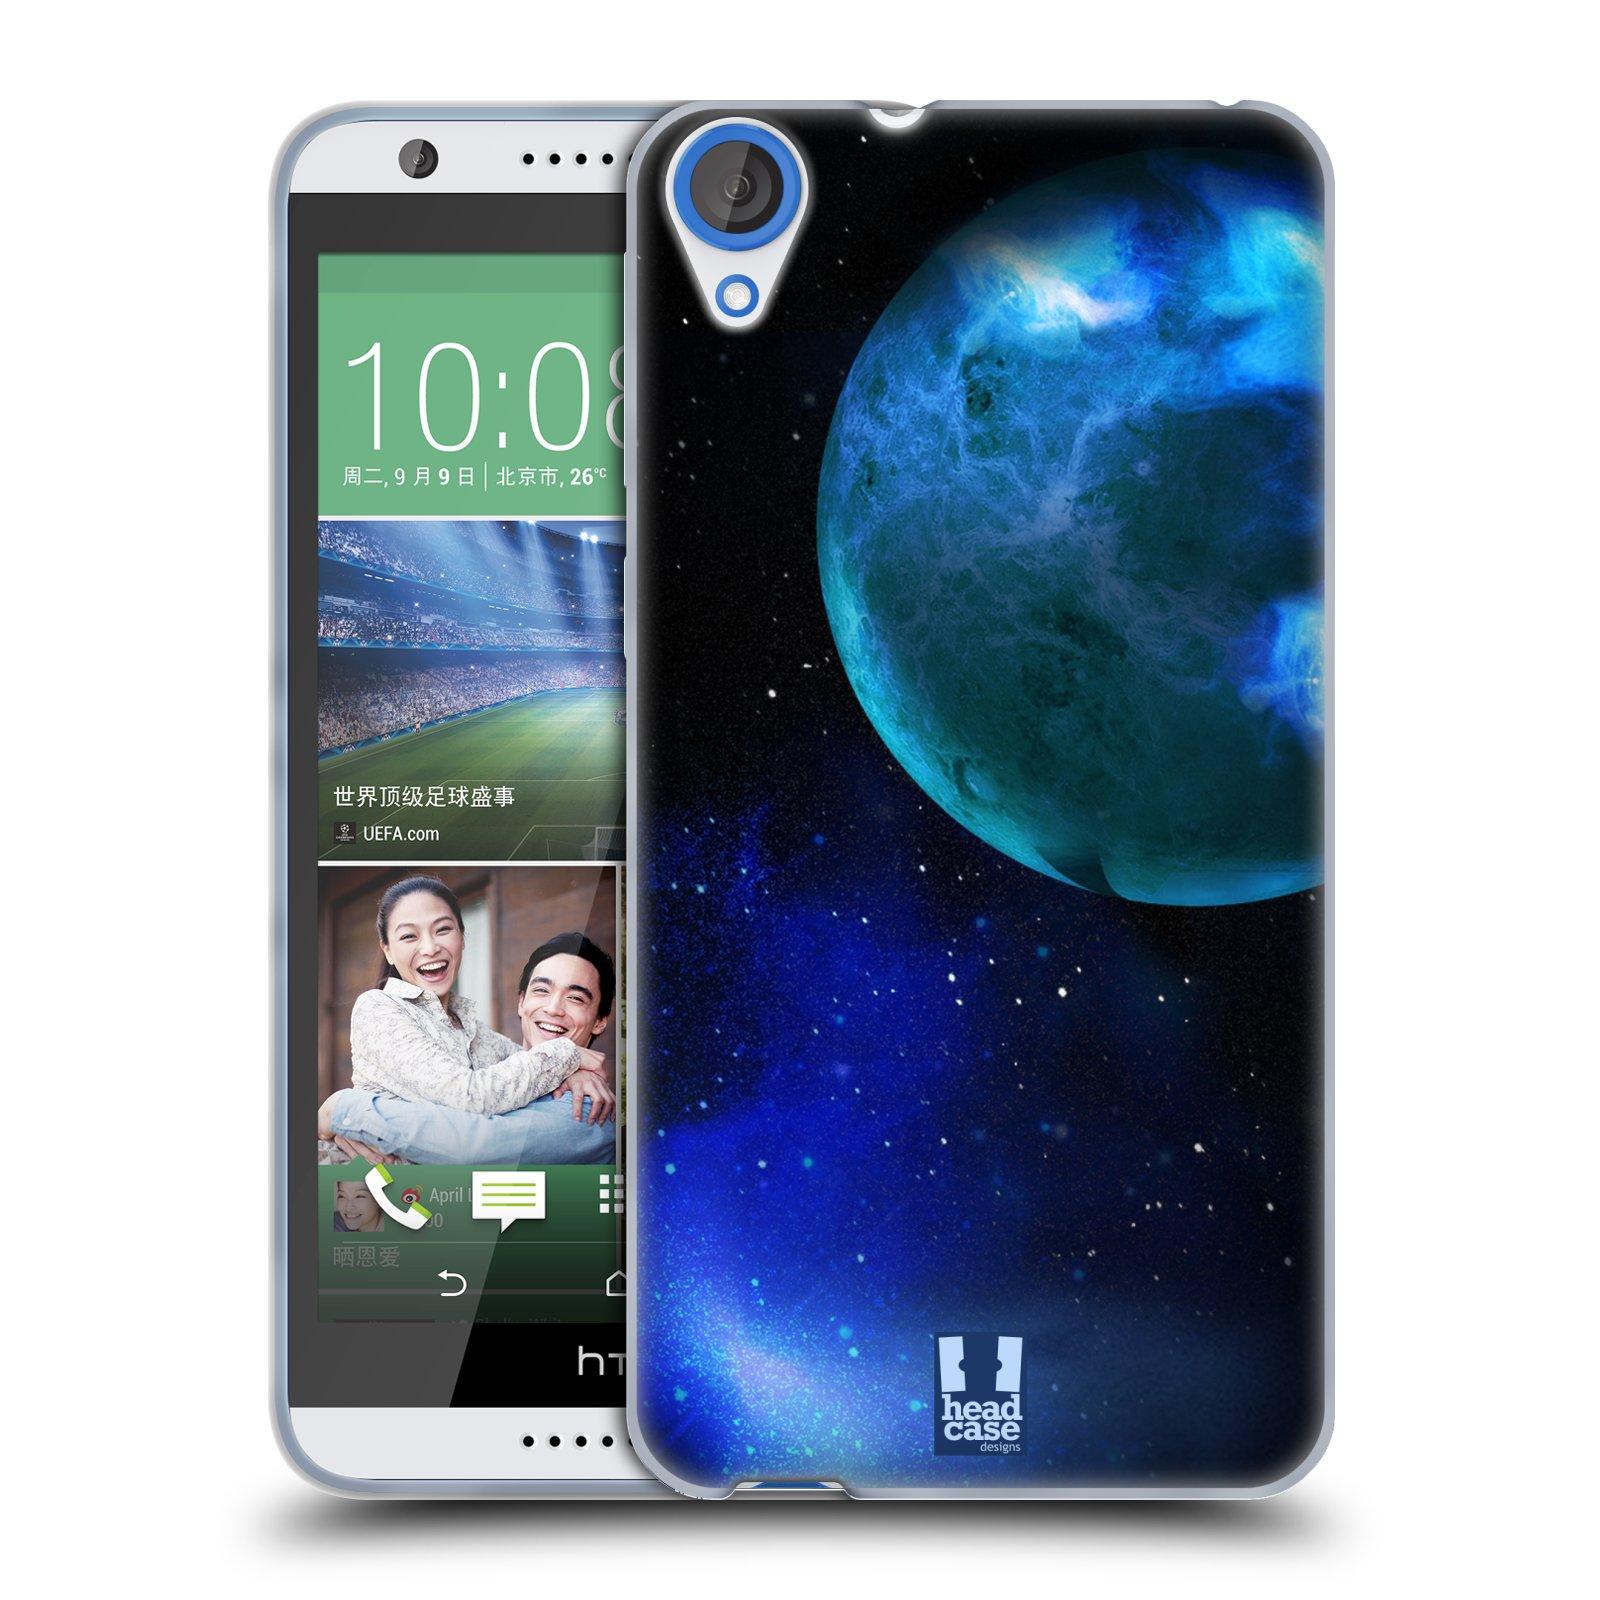 Silikonové pouzdro na mobil HTC Desire 820 HEAD CASE VENUŠE (Silikonový kryt či obal na mobilní telefon HTC Desire 820)